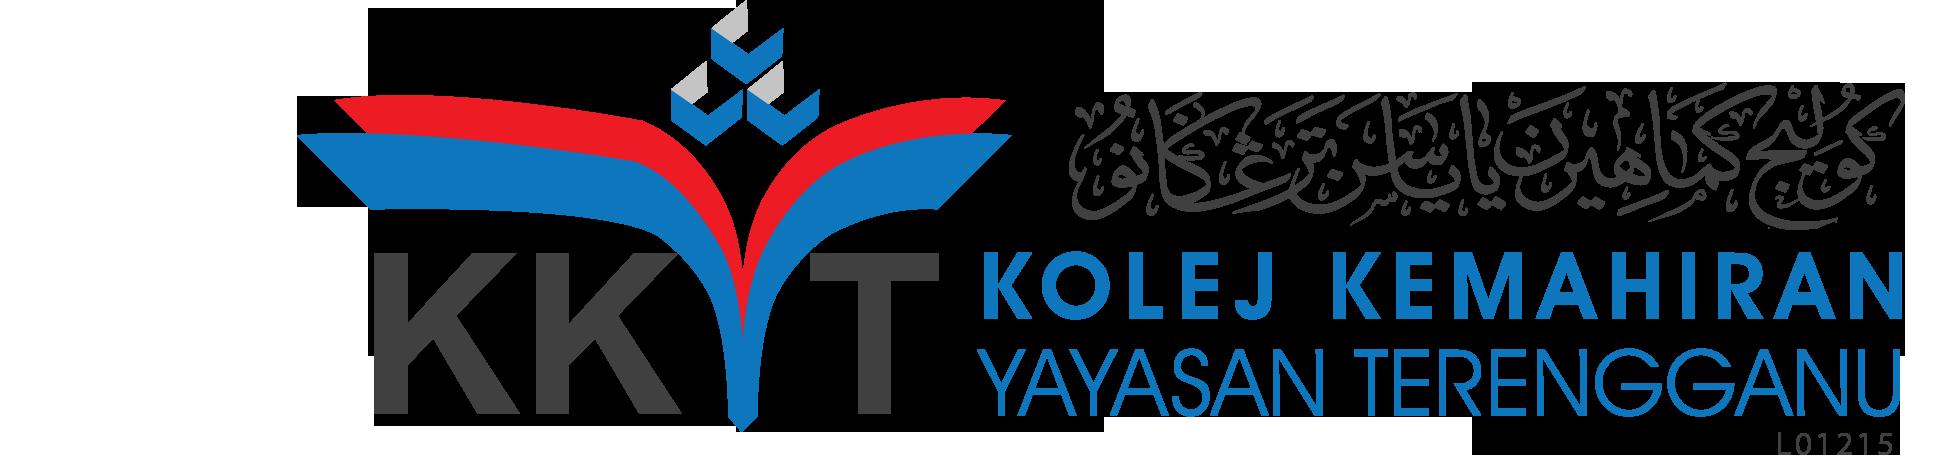 KKYT | Kolej Kemahiran Yayasan Terengganu